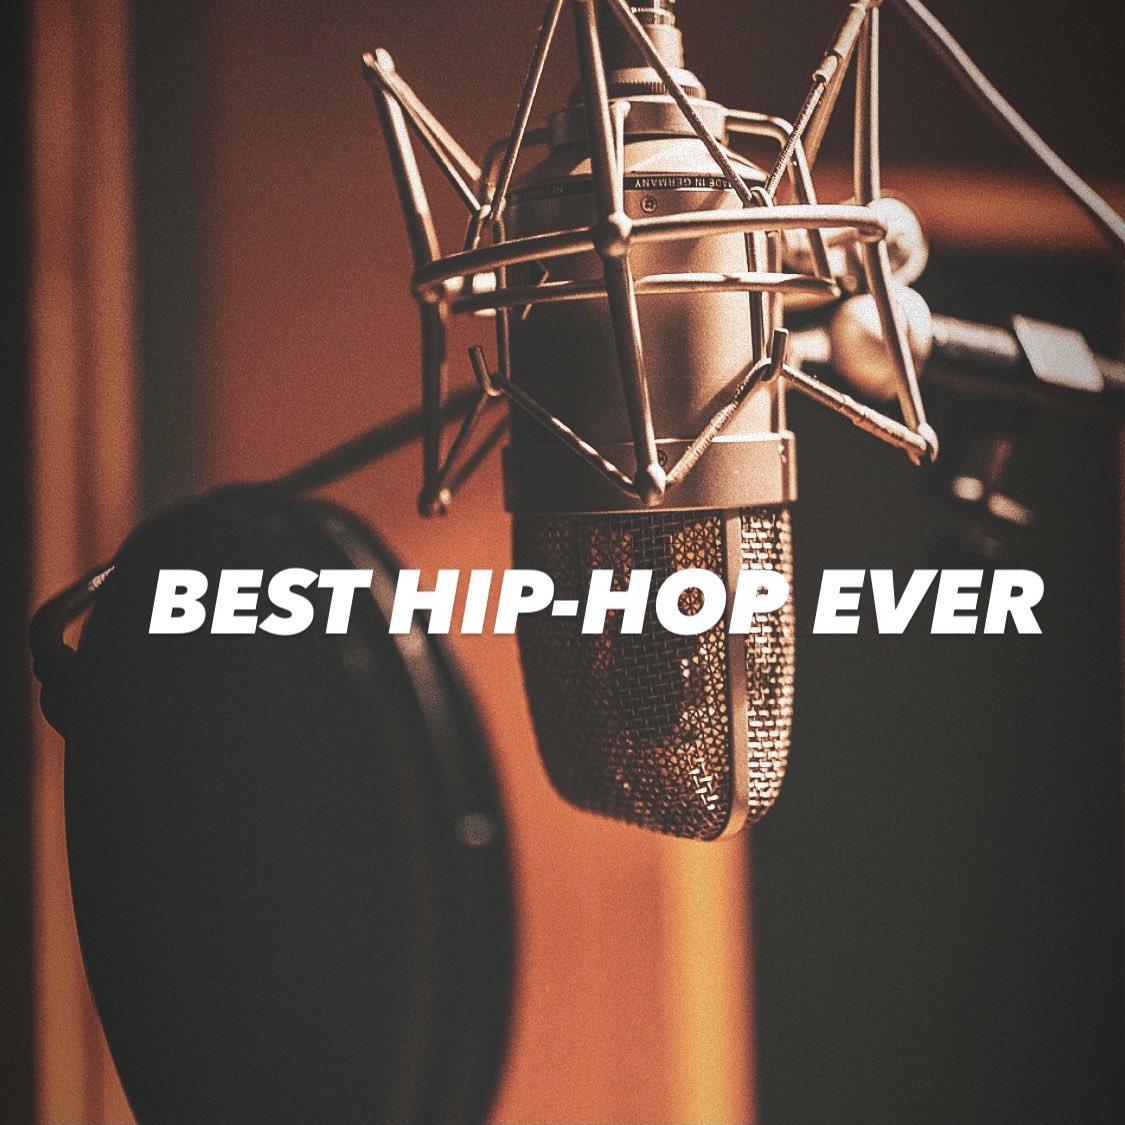 The Best Hip Hop Playlist Ever updated w/ @OswinBenjamin @NyckCaution @Thurzday @StatikSelekt @Grip_SS @IamDomani @redveil @EarthGang @oranicuhh @LivinANoyd @che_noir @UFOFev @MarlonCraft @AdamDollars @DoemanxDyna @dviousmindz + more   Spotify/Apple/Tidal: